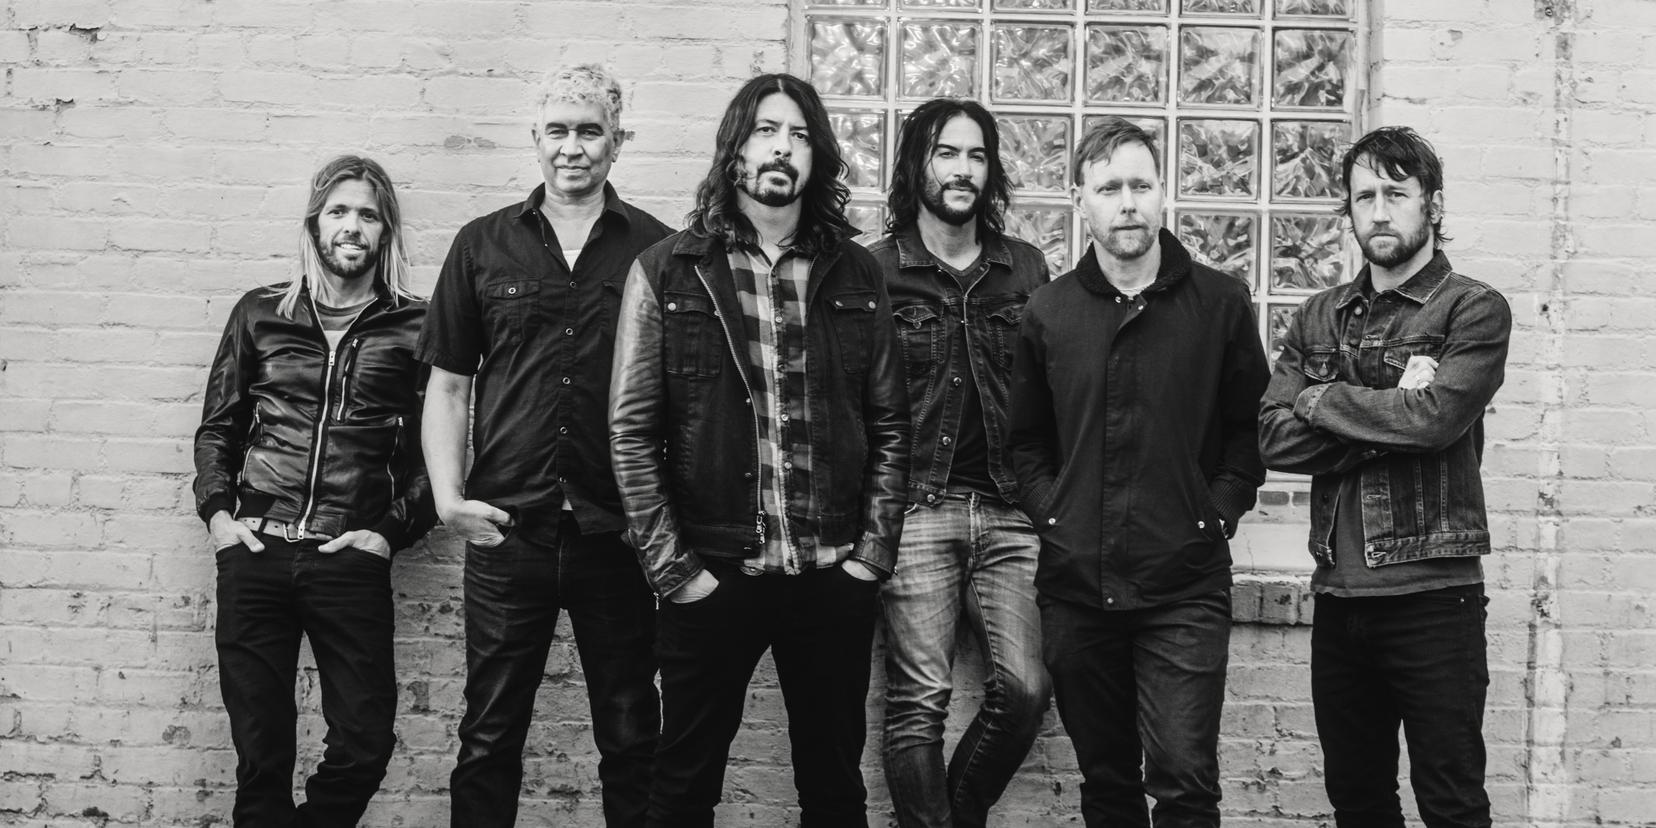 Foo Fighters to begin working on new album this week